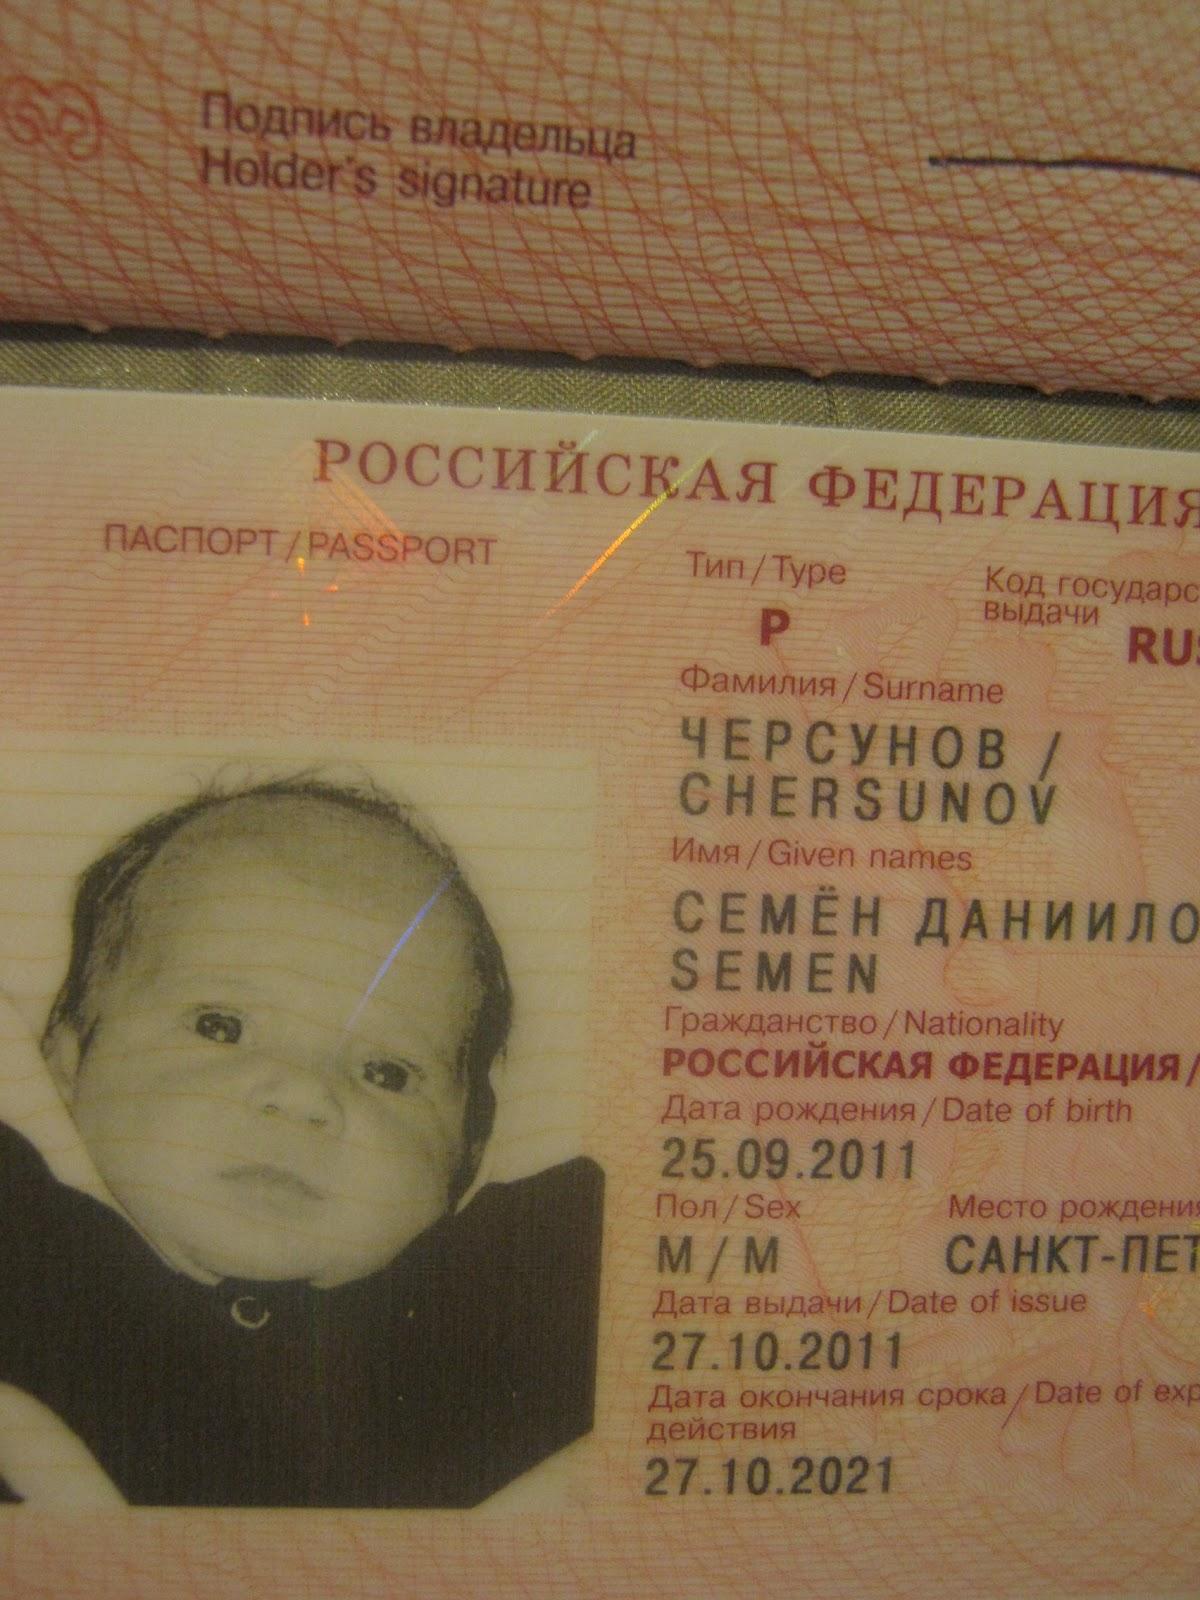 Фото на загран старого образца требования для ребенка